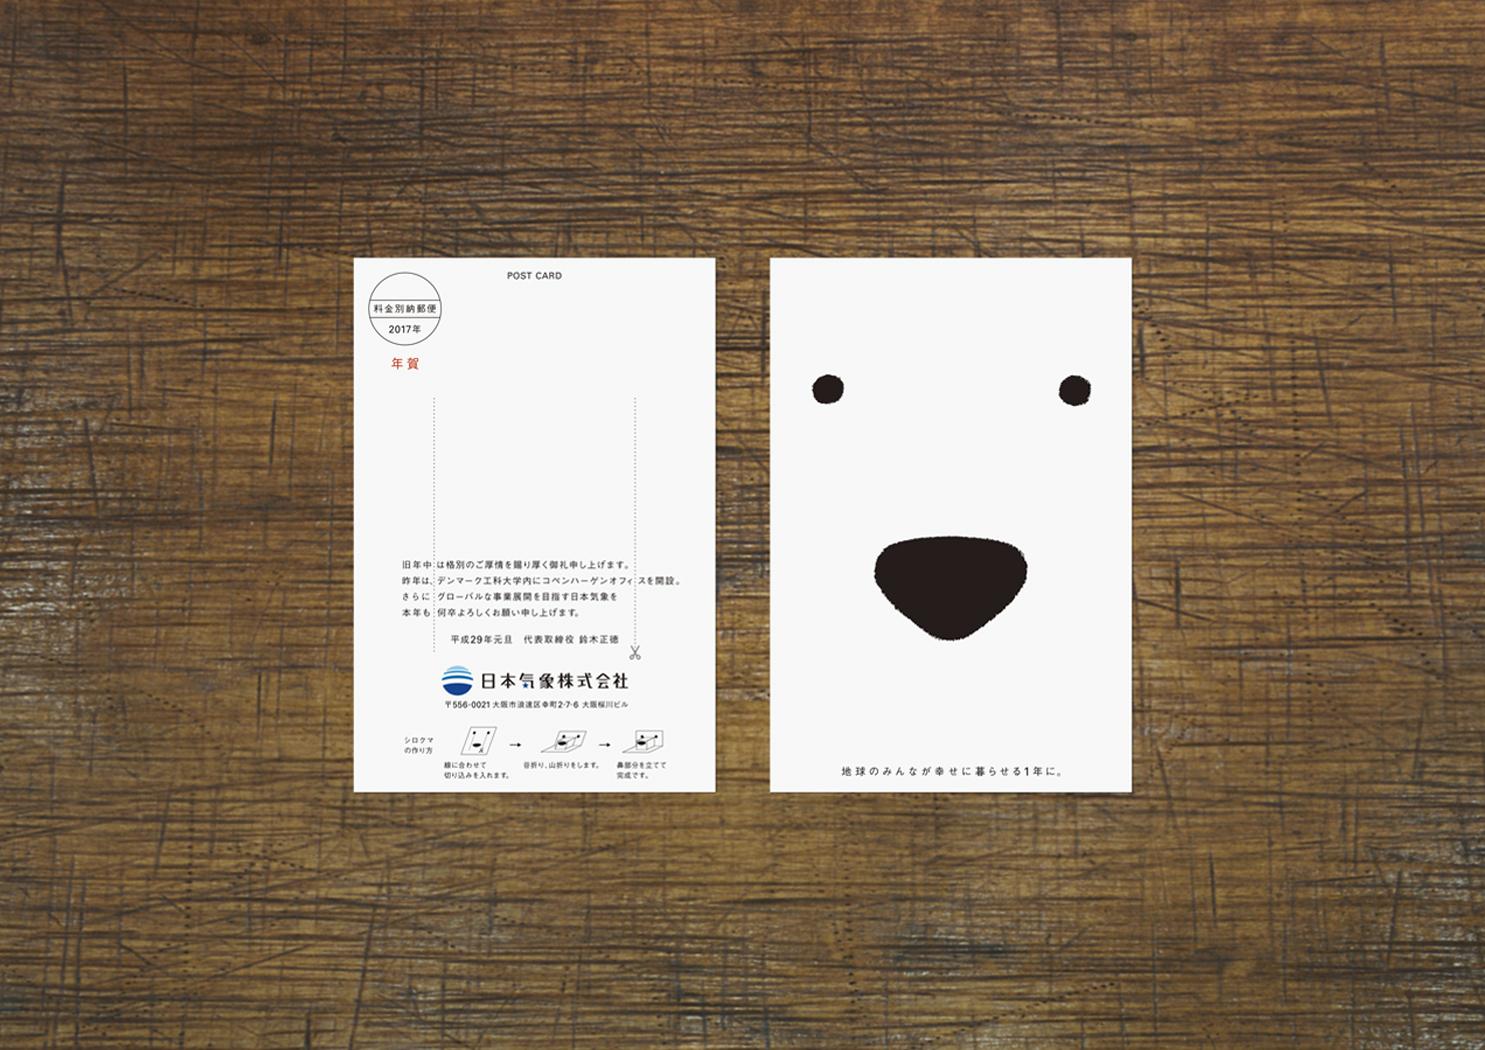 Nihonkisho New Year's Card 2017